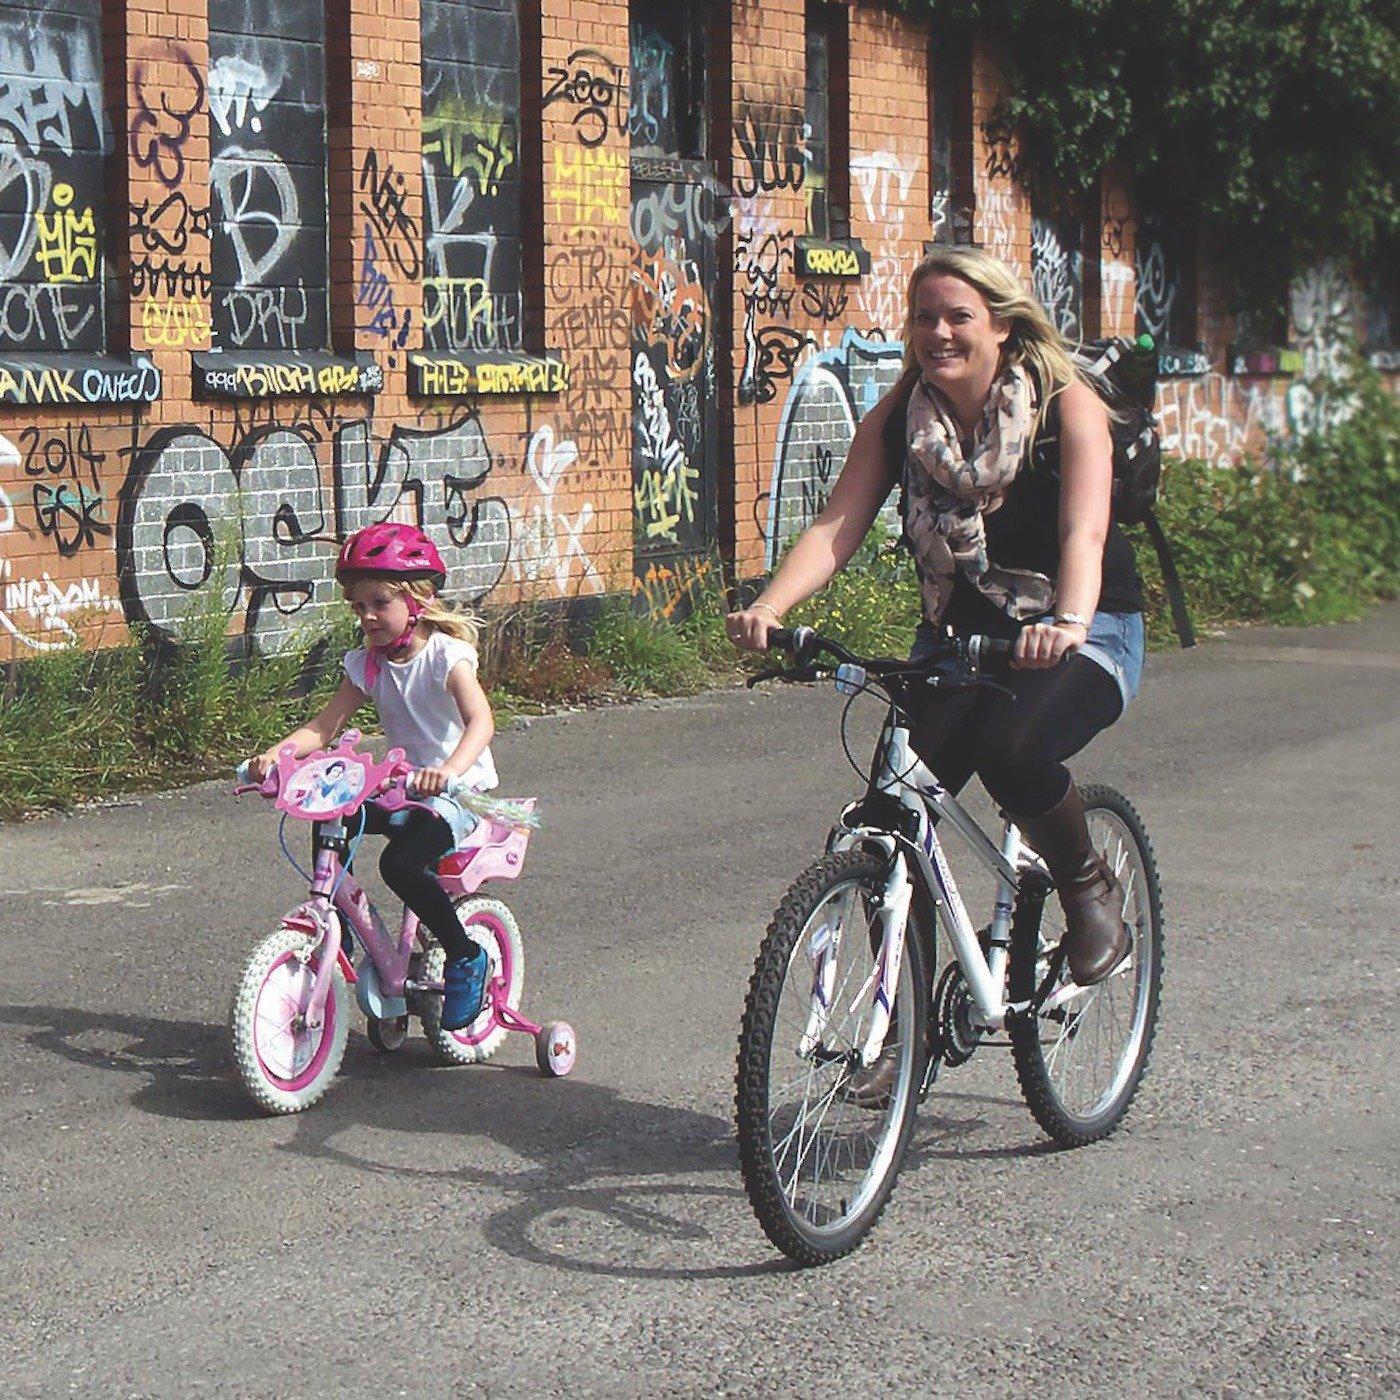 Cycling Campaign and coronavirus